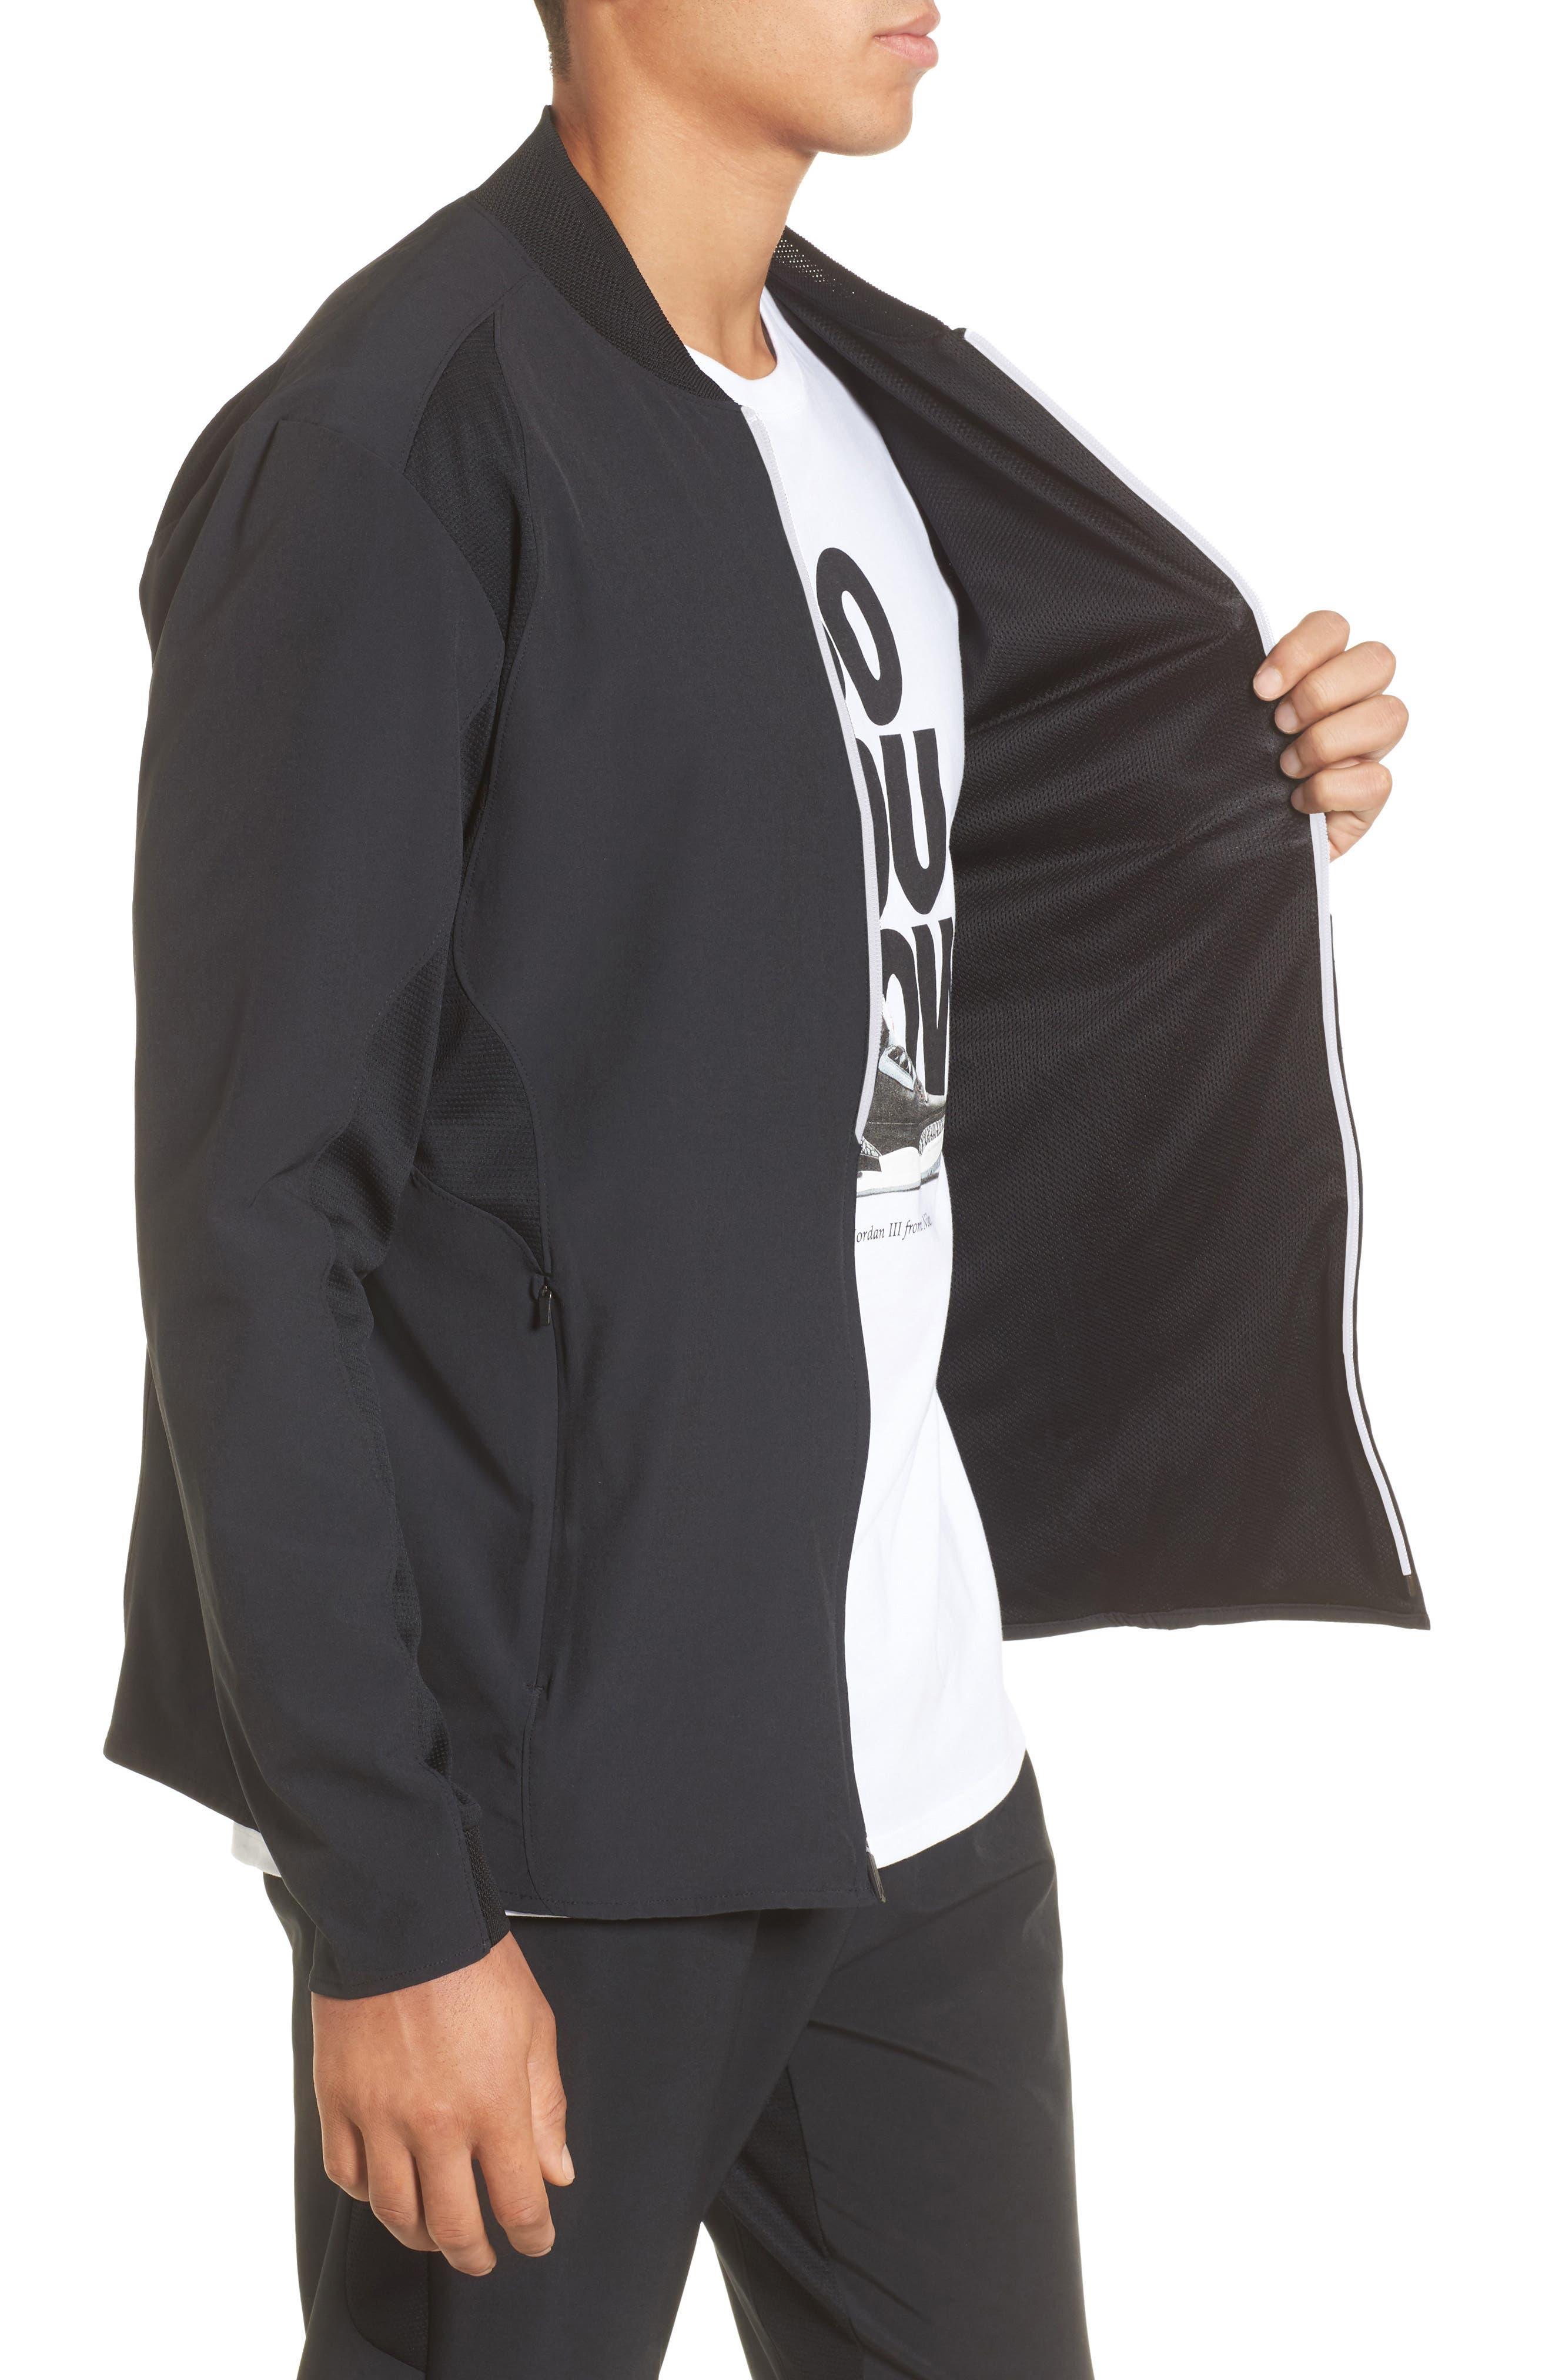 23 Alpha Dry Jacket,                             Alternate thumbnail 3, color,